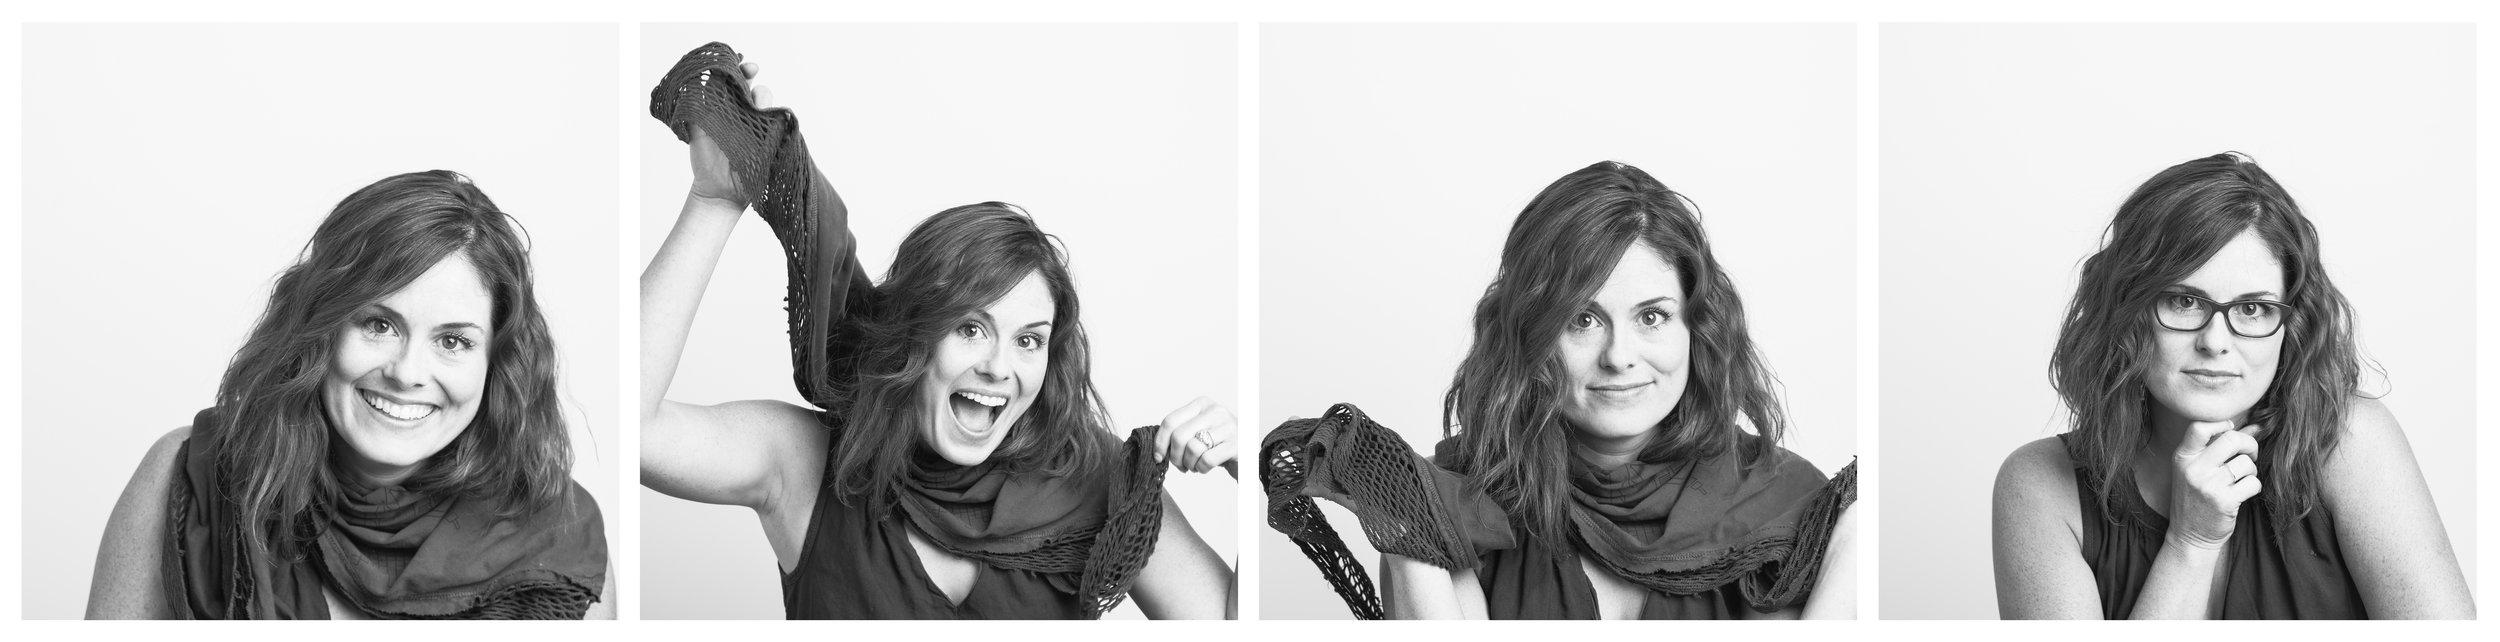 Melissa Headshot fimstrip.jpg